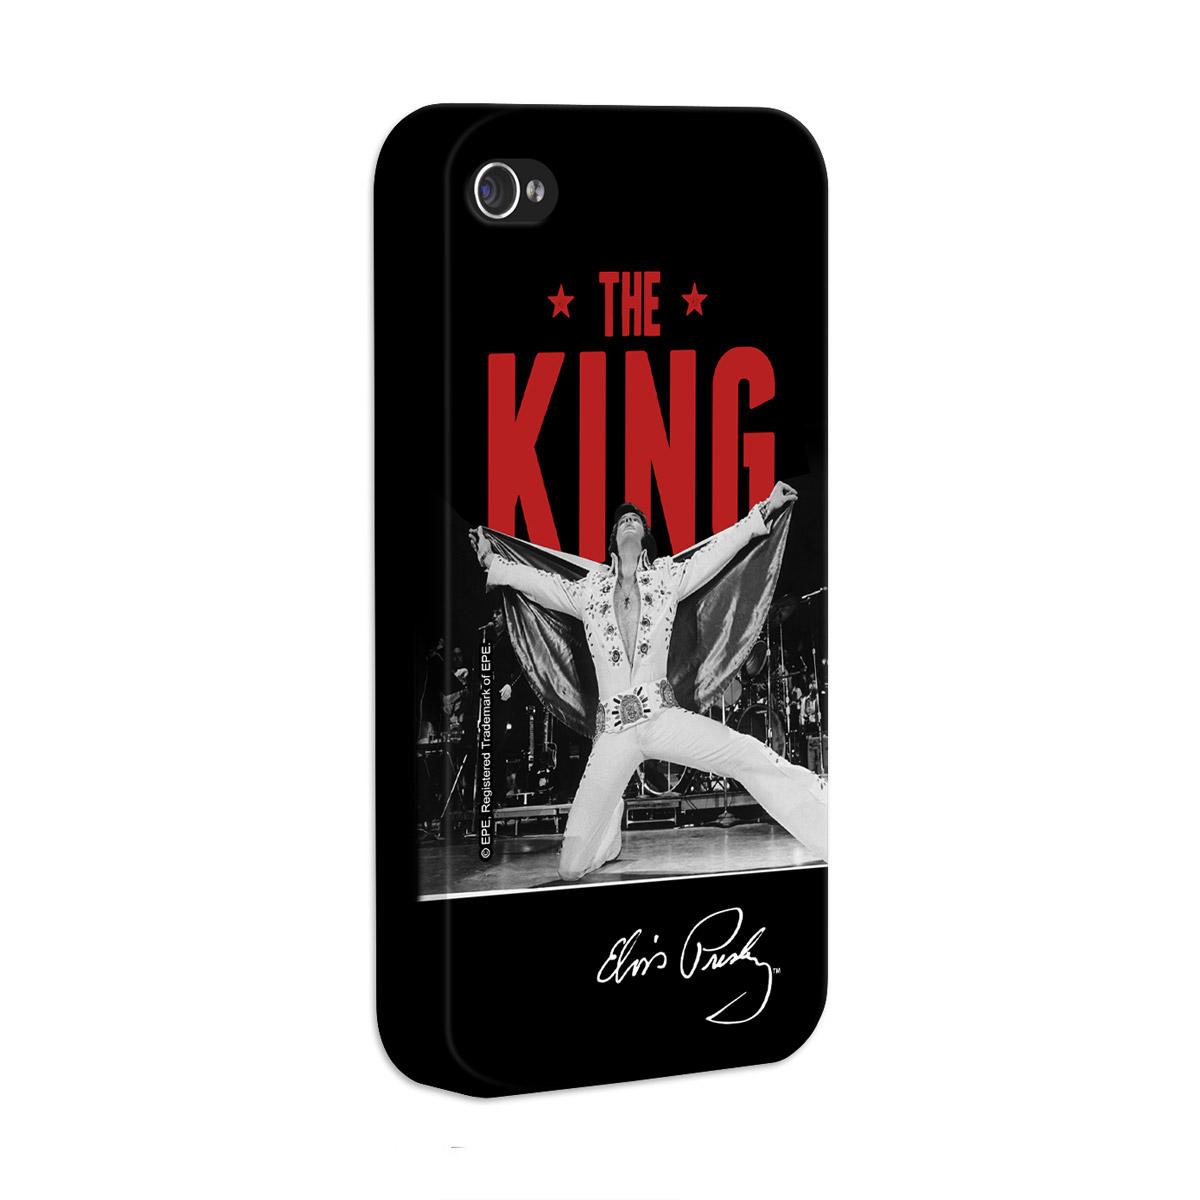 Kit Com 3 Capas de iPhone 4/4S Elvis Presley The King